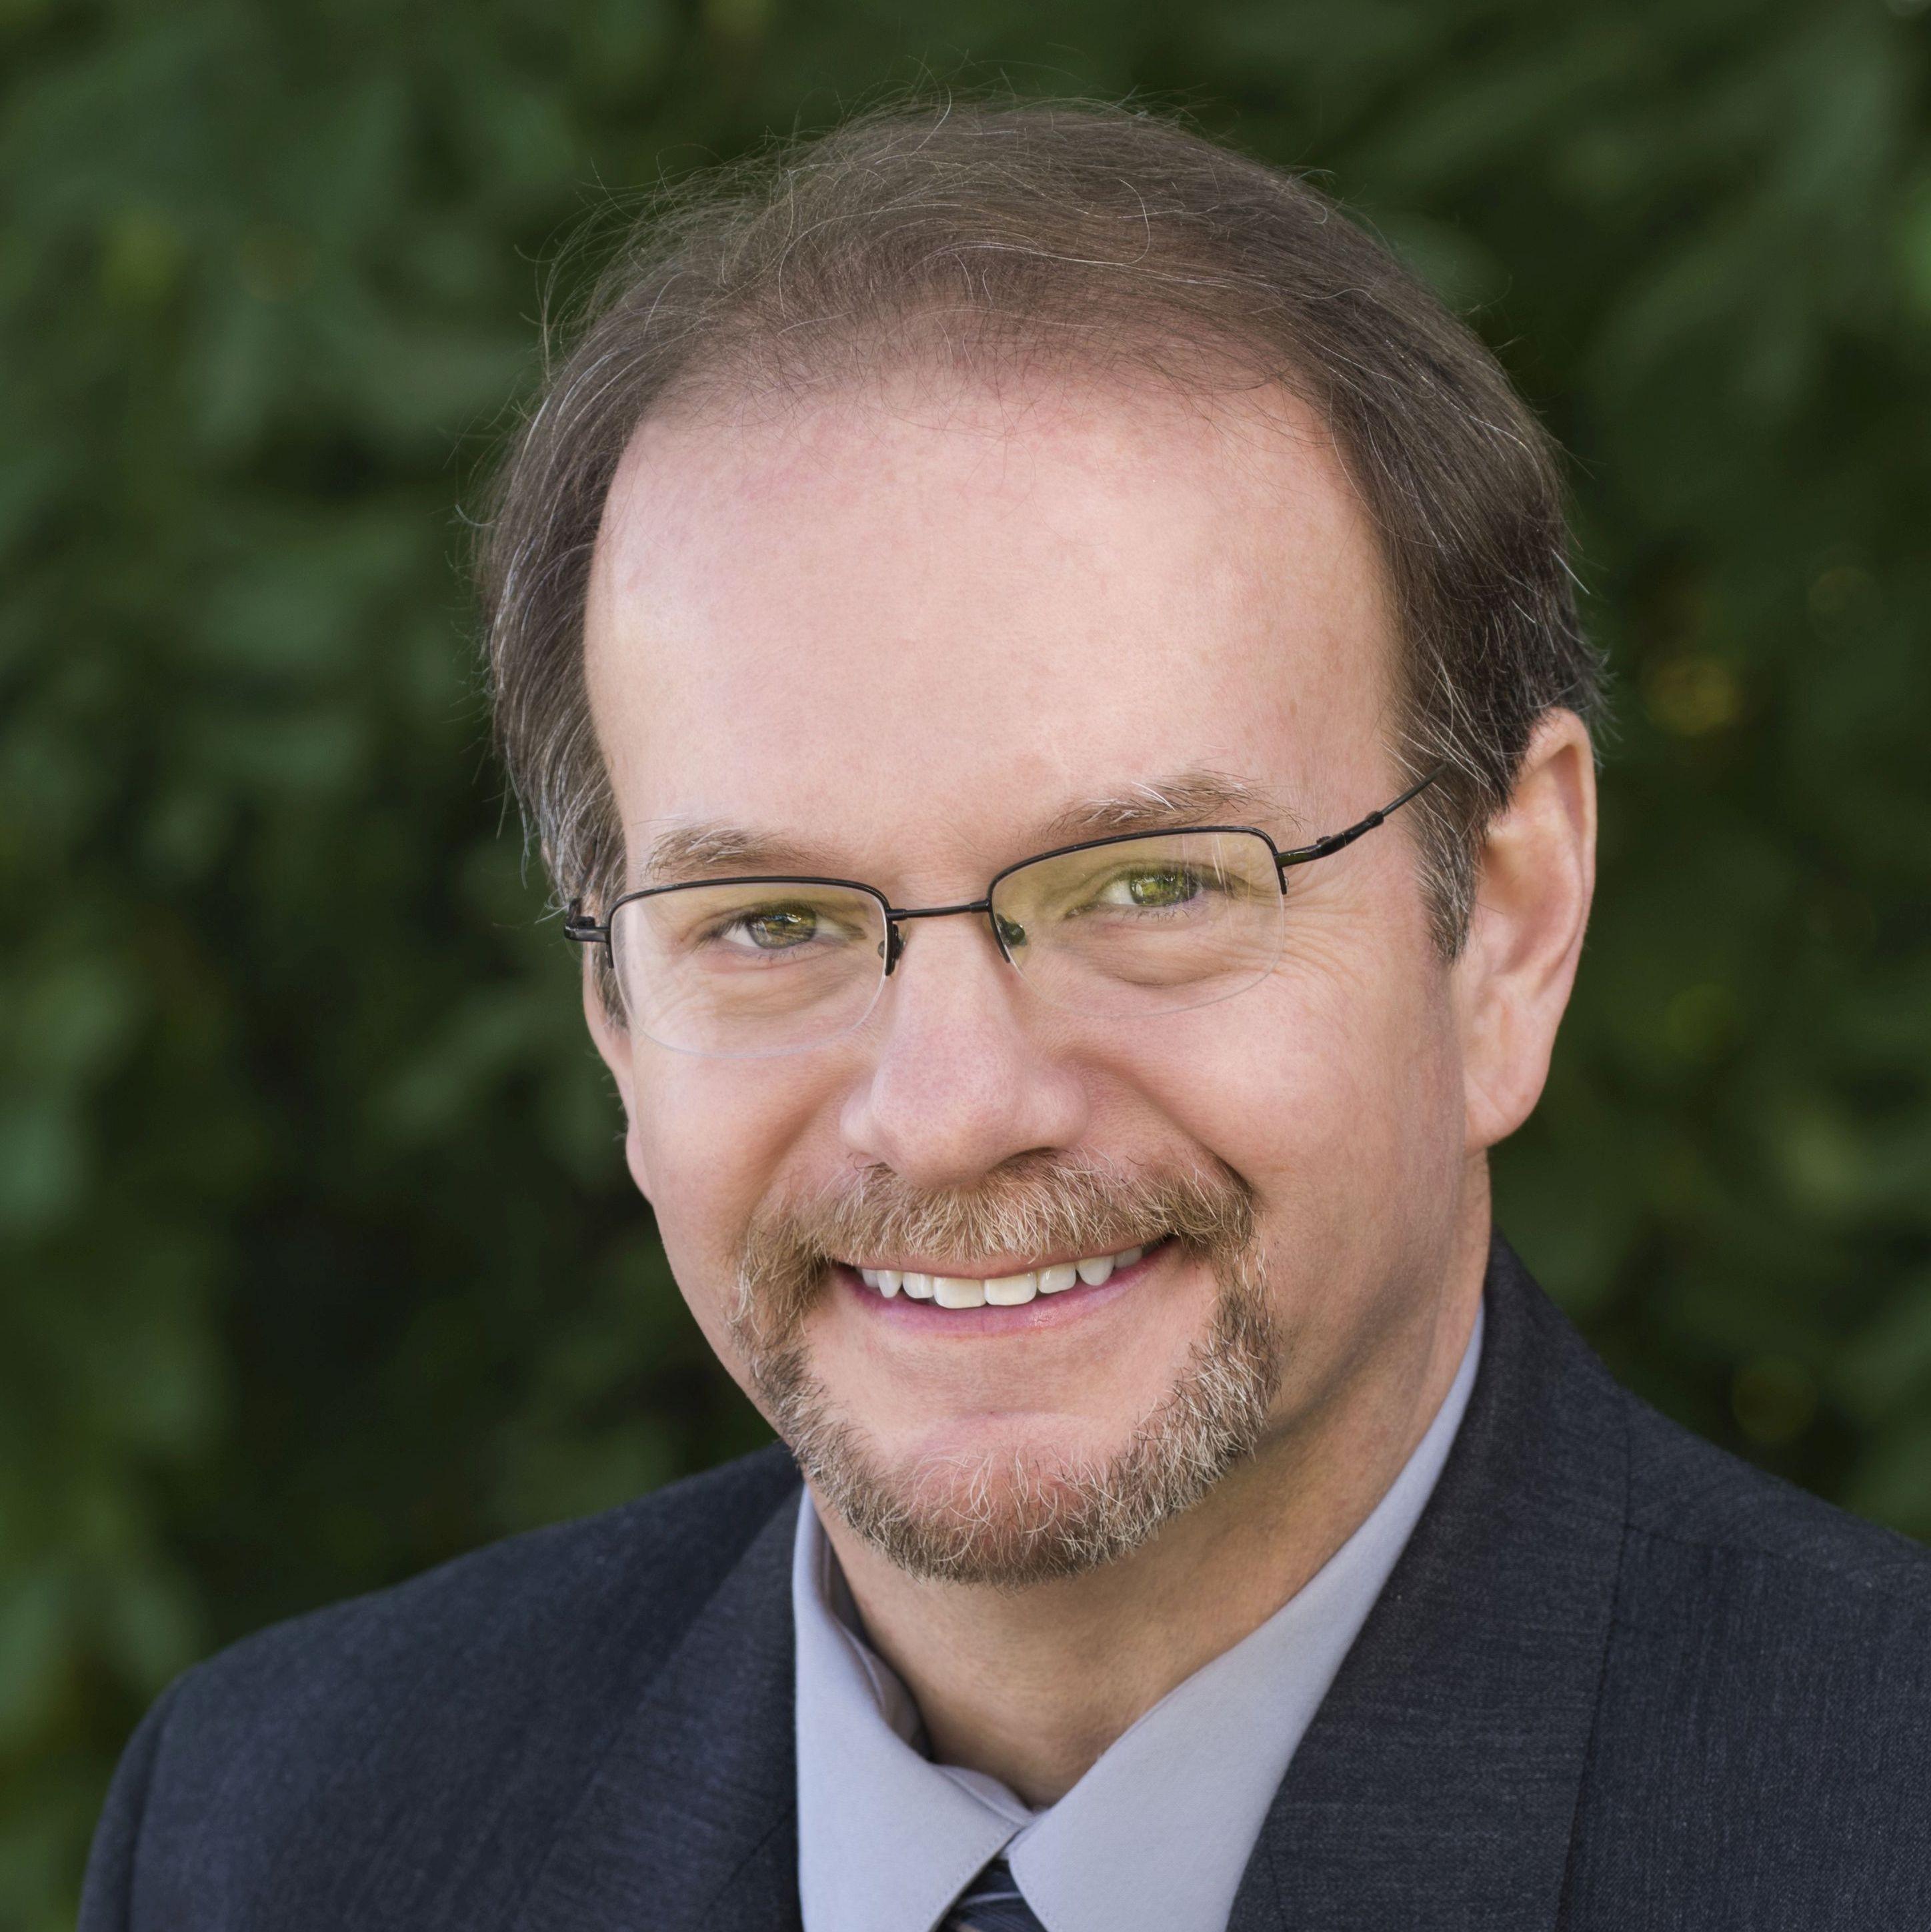 Daniel Bobinski